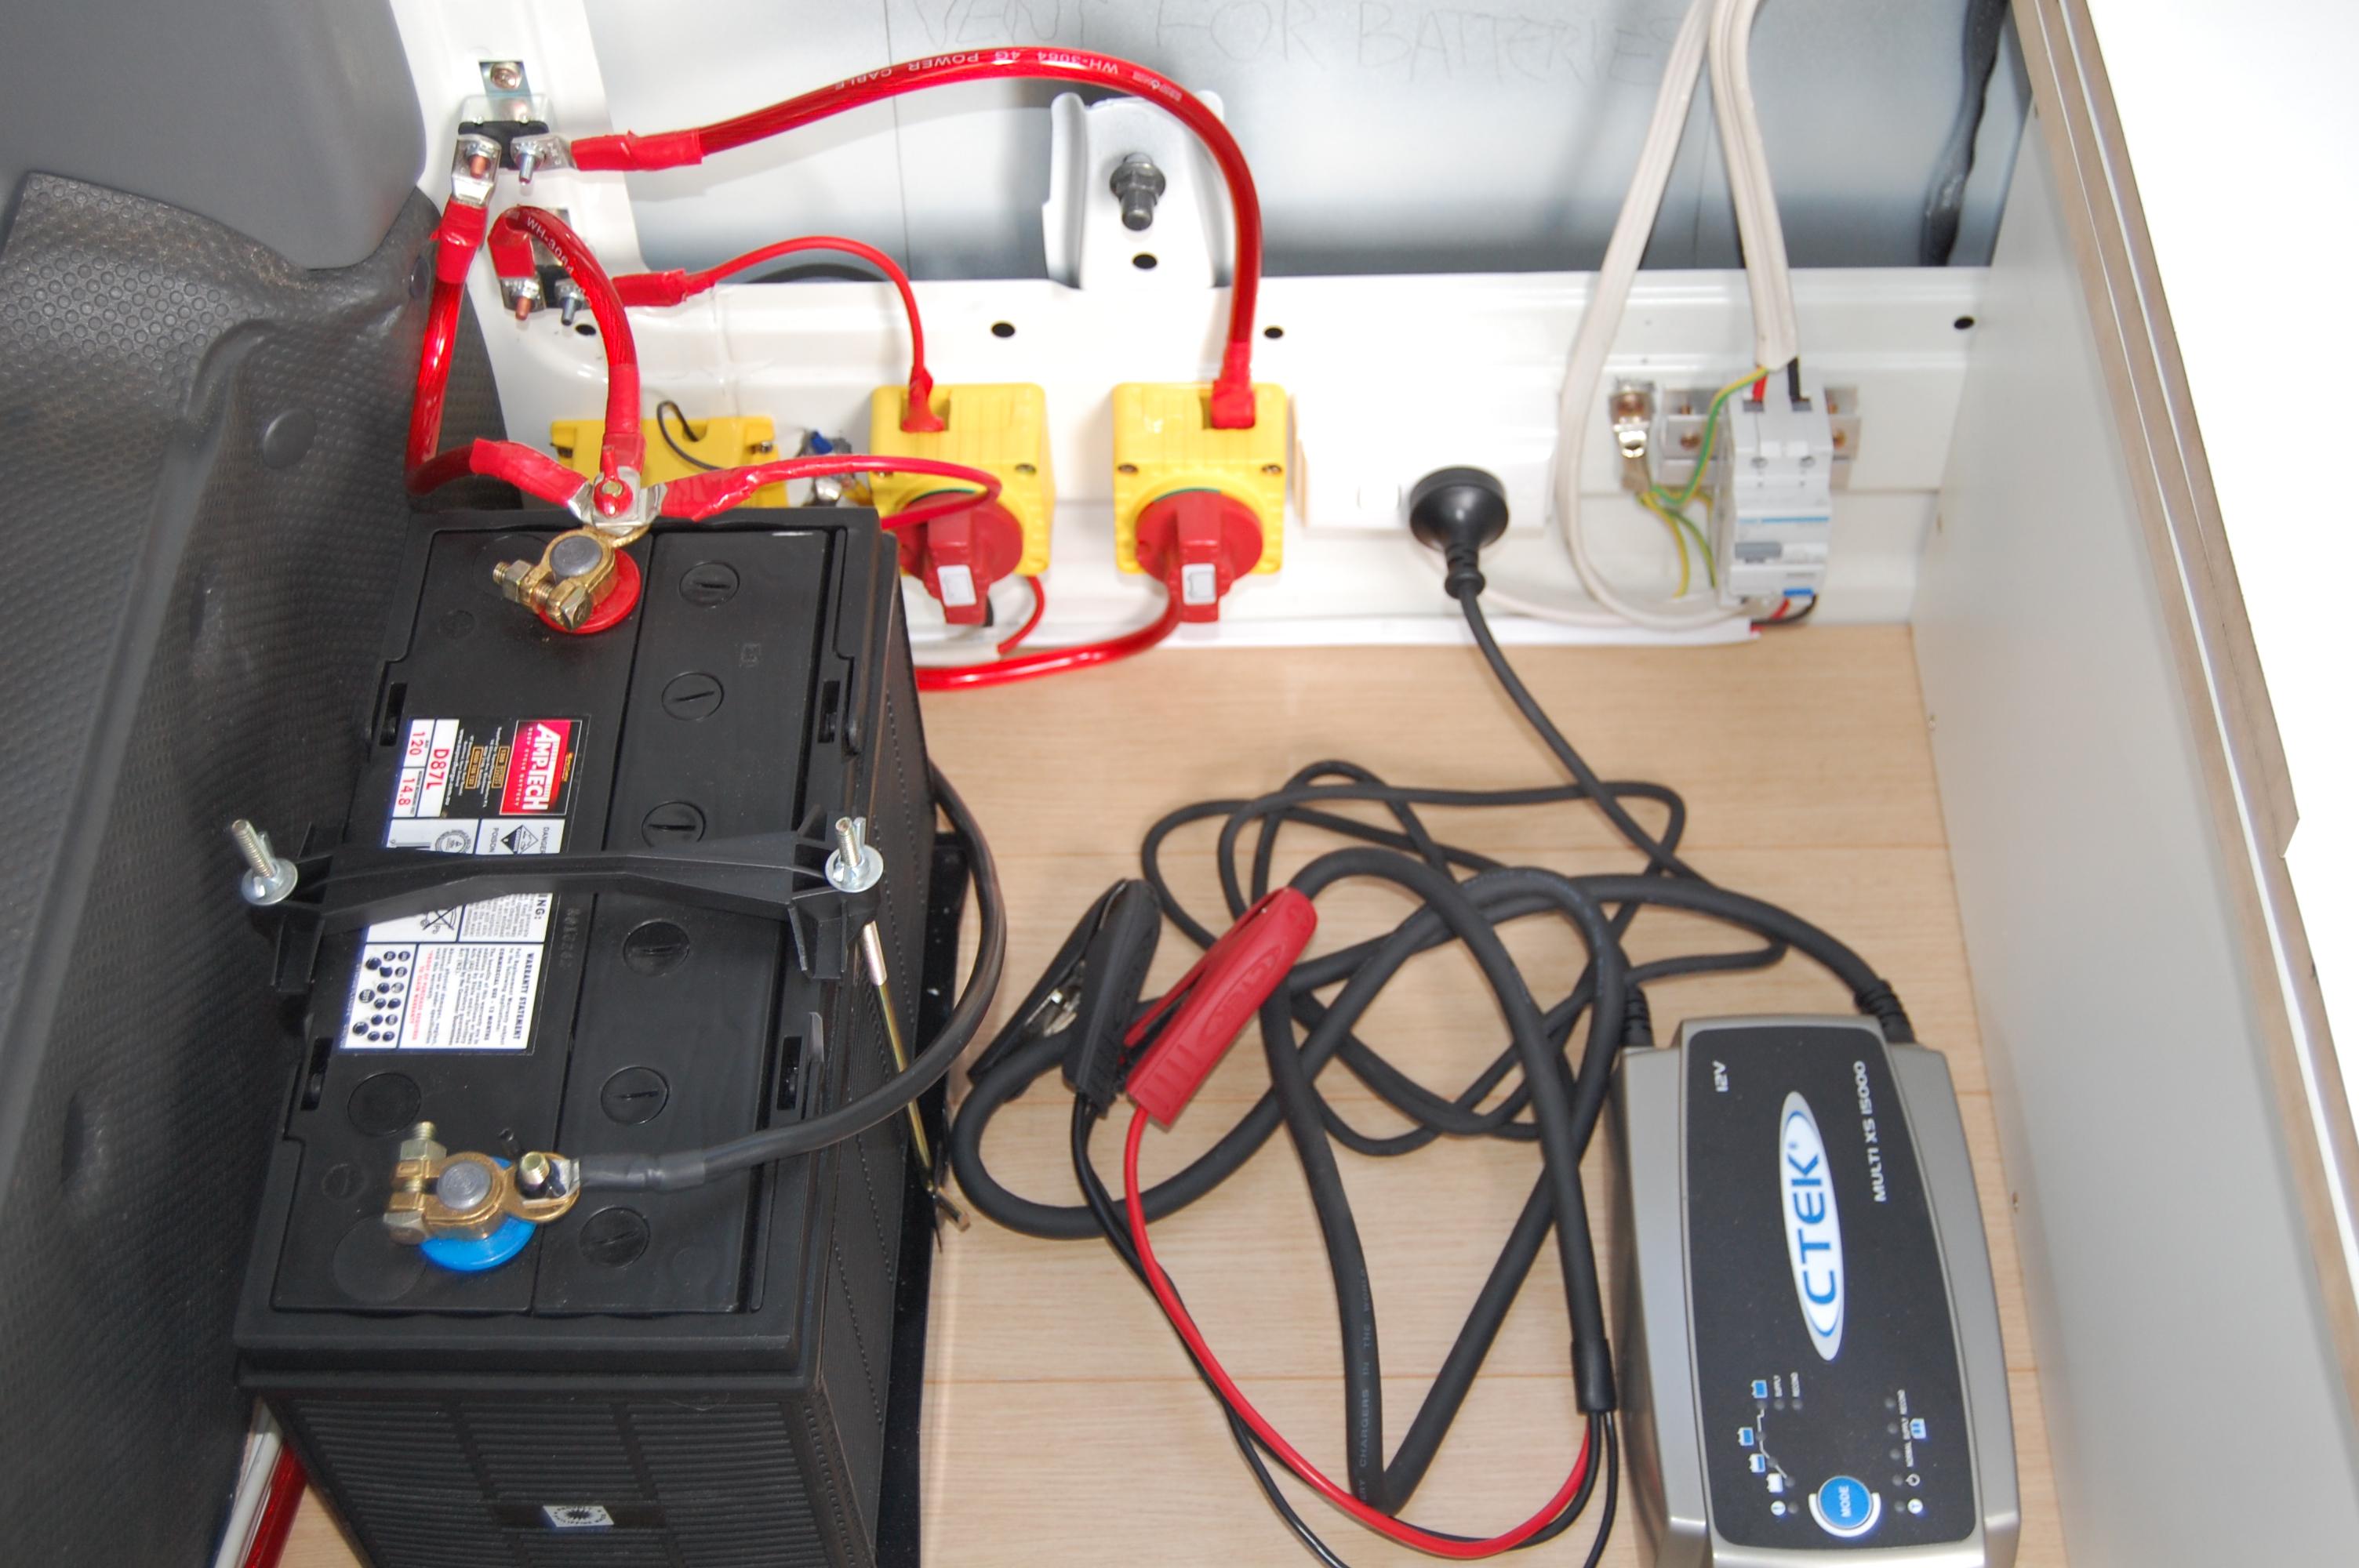 hight resolution of rv 12v 240v wiring diagram wiring diagram advance 12v 240v caravan wiring diagram wiring diagram experts